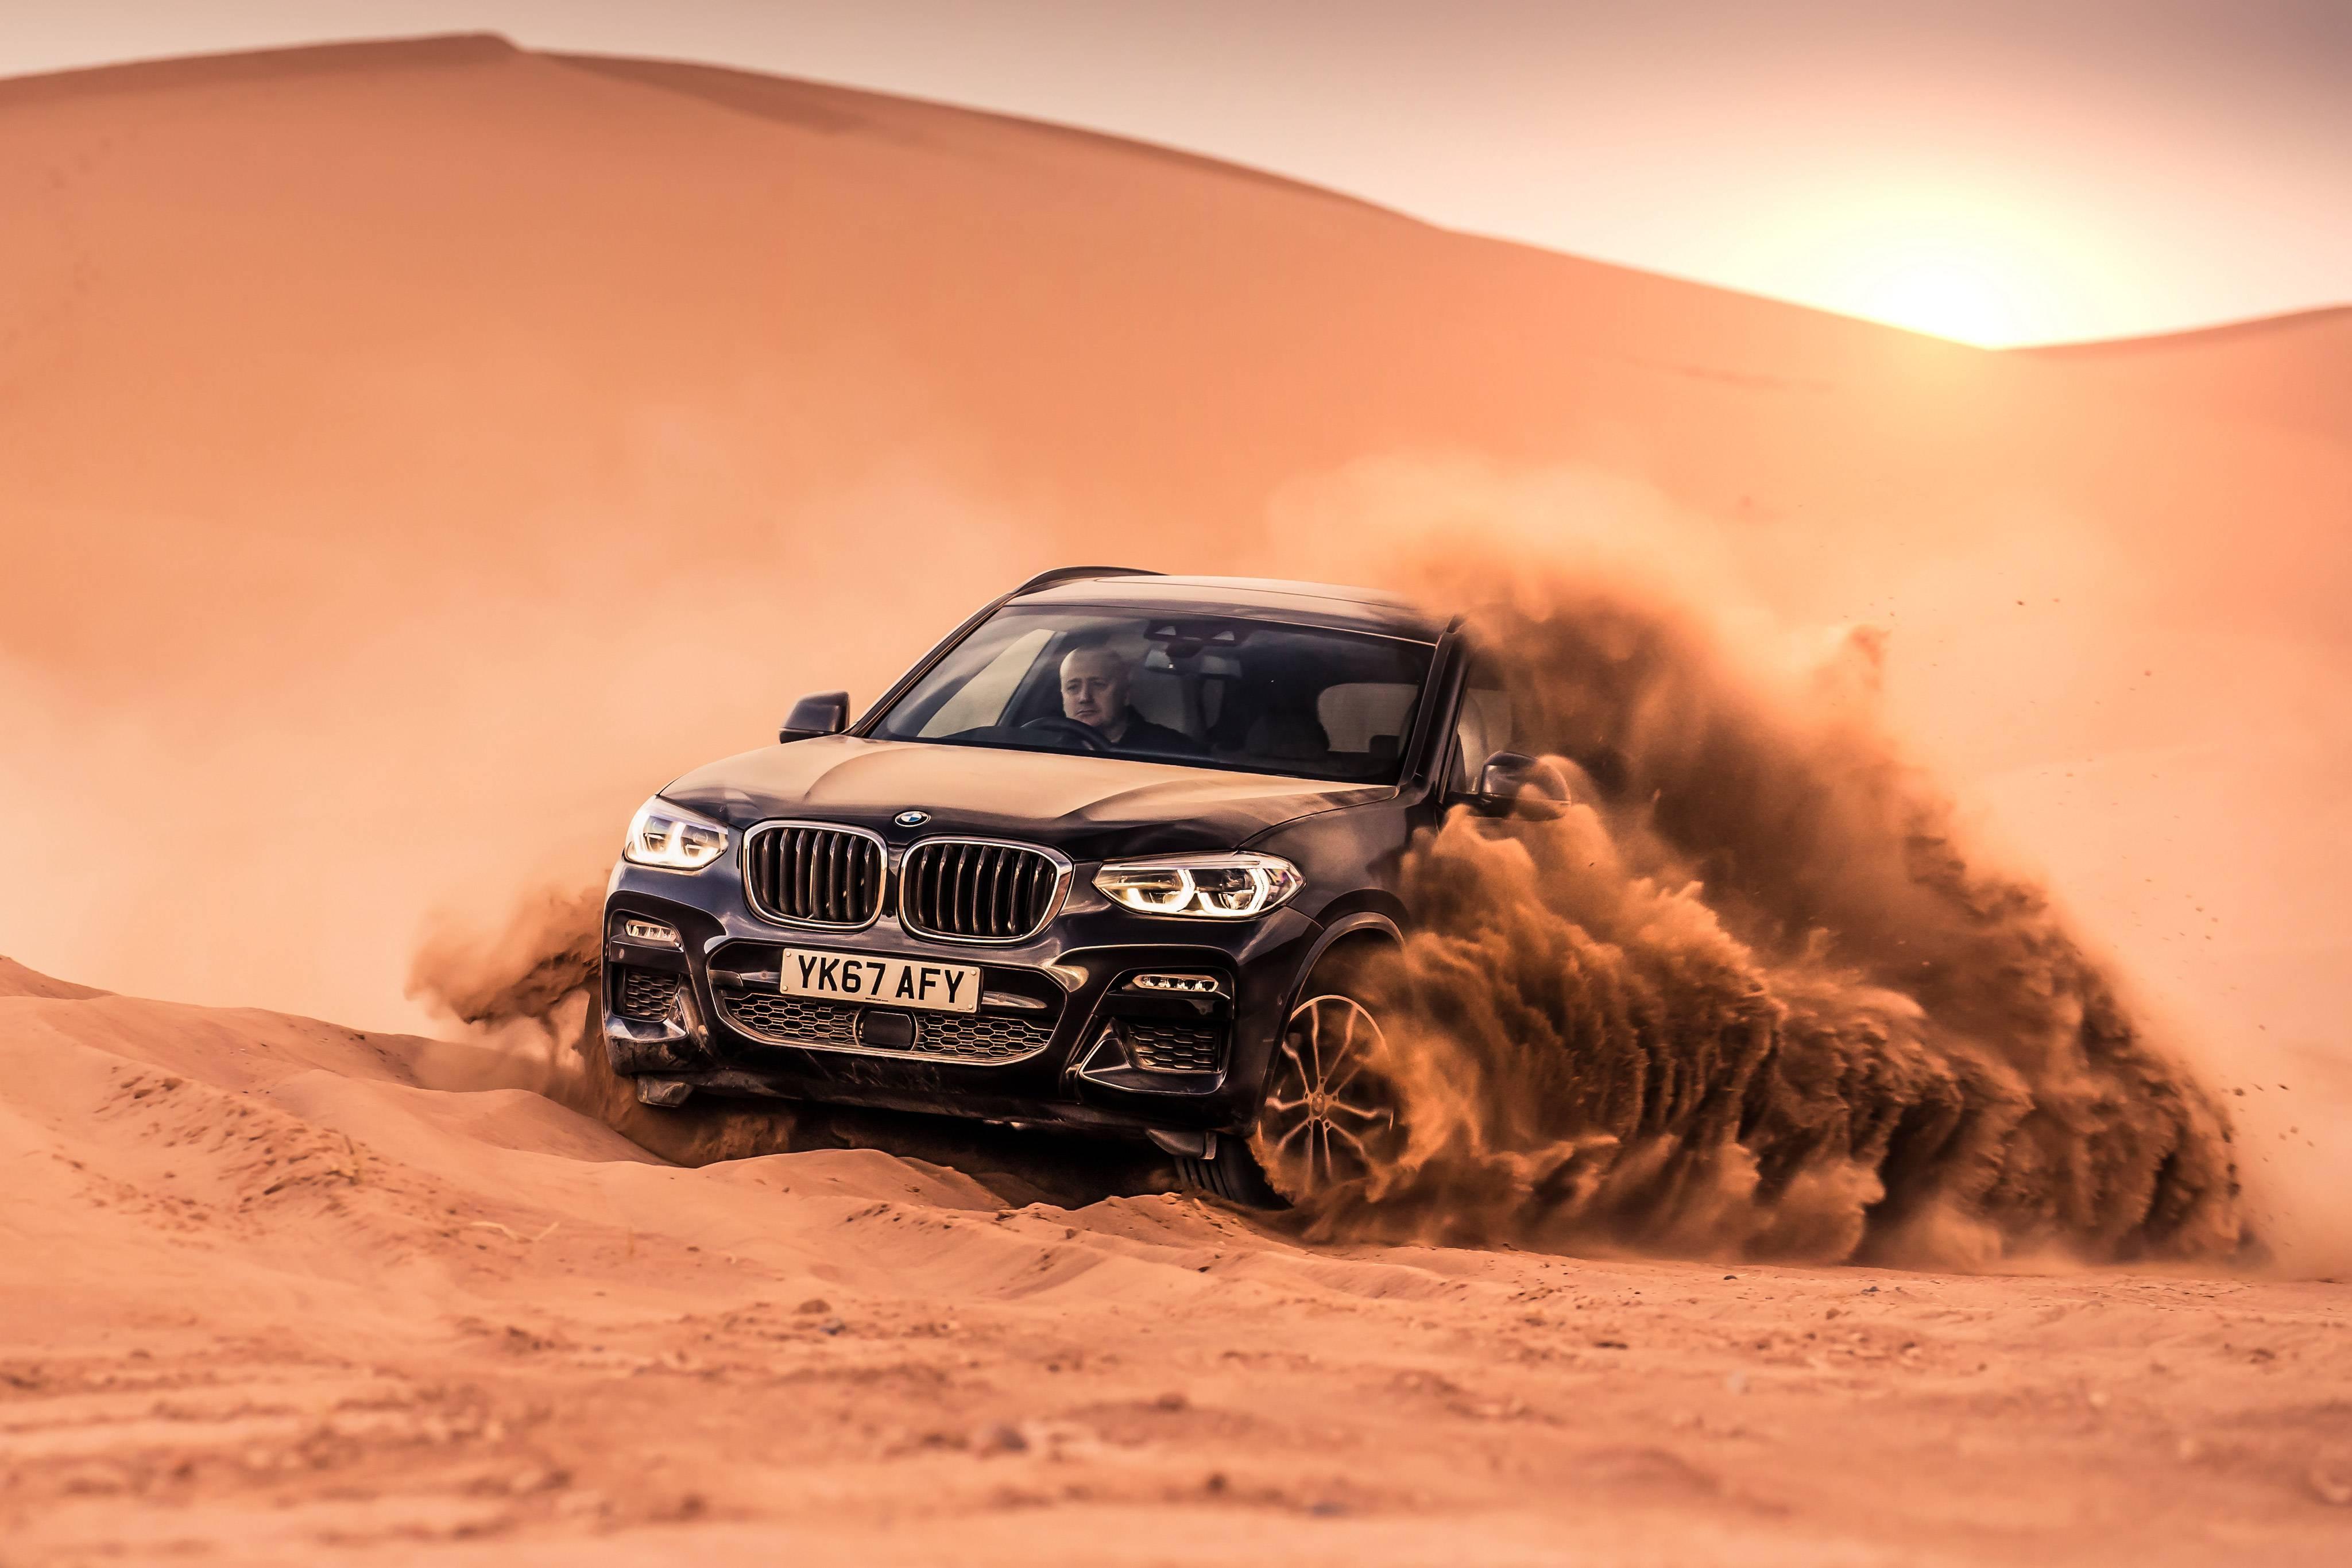 BMW X3 M Sport 2017 Wallpaper